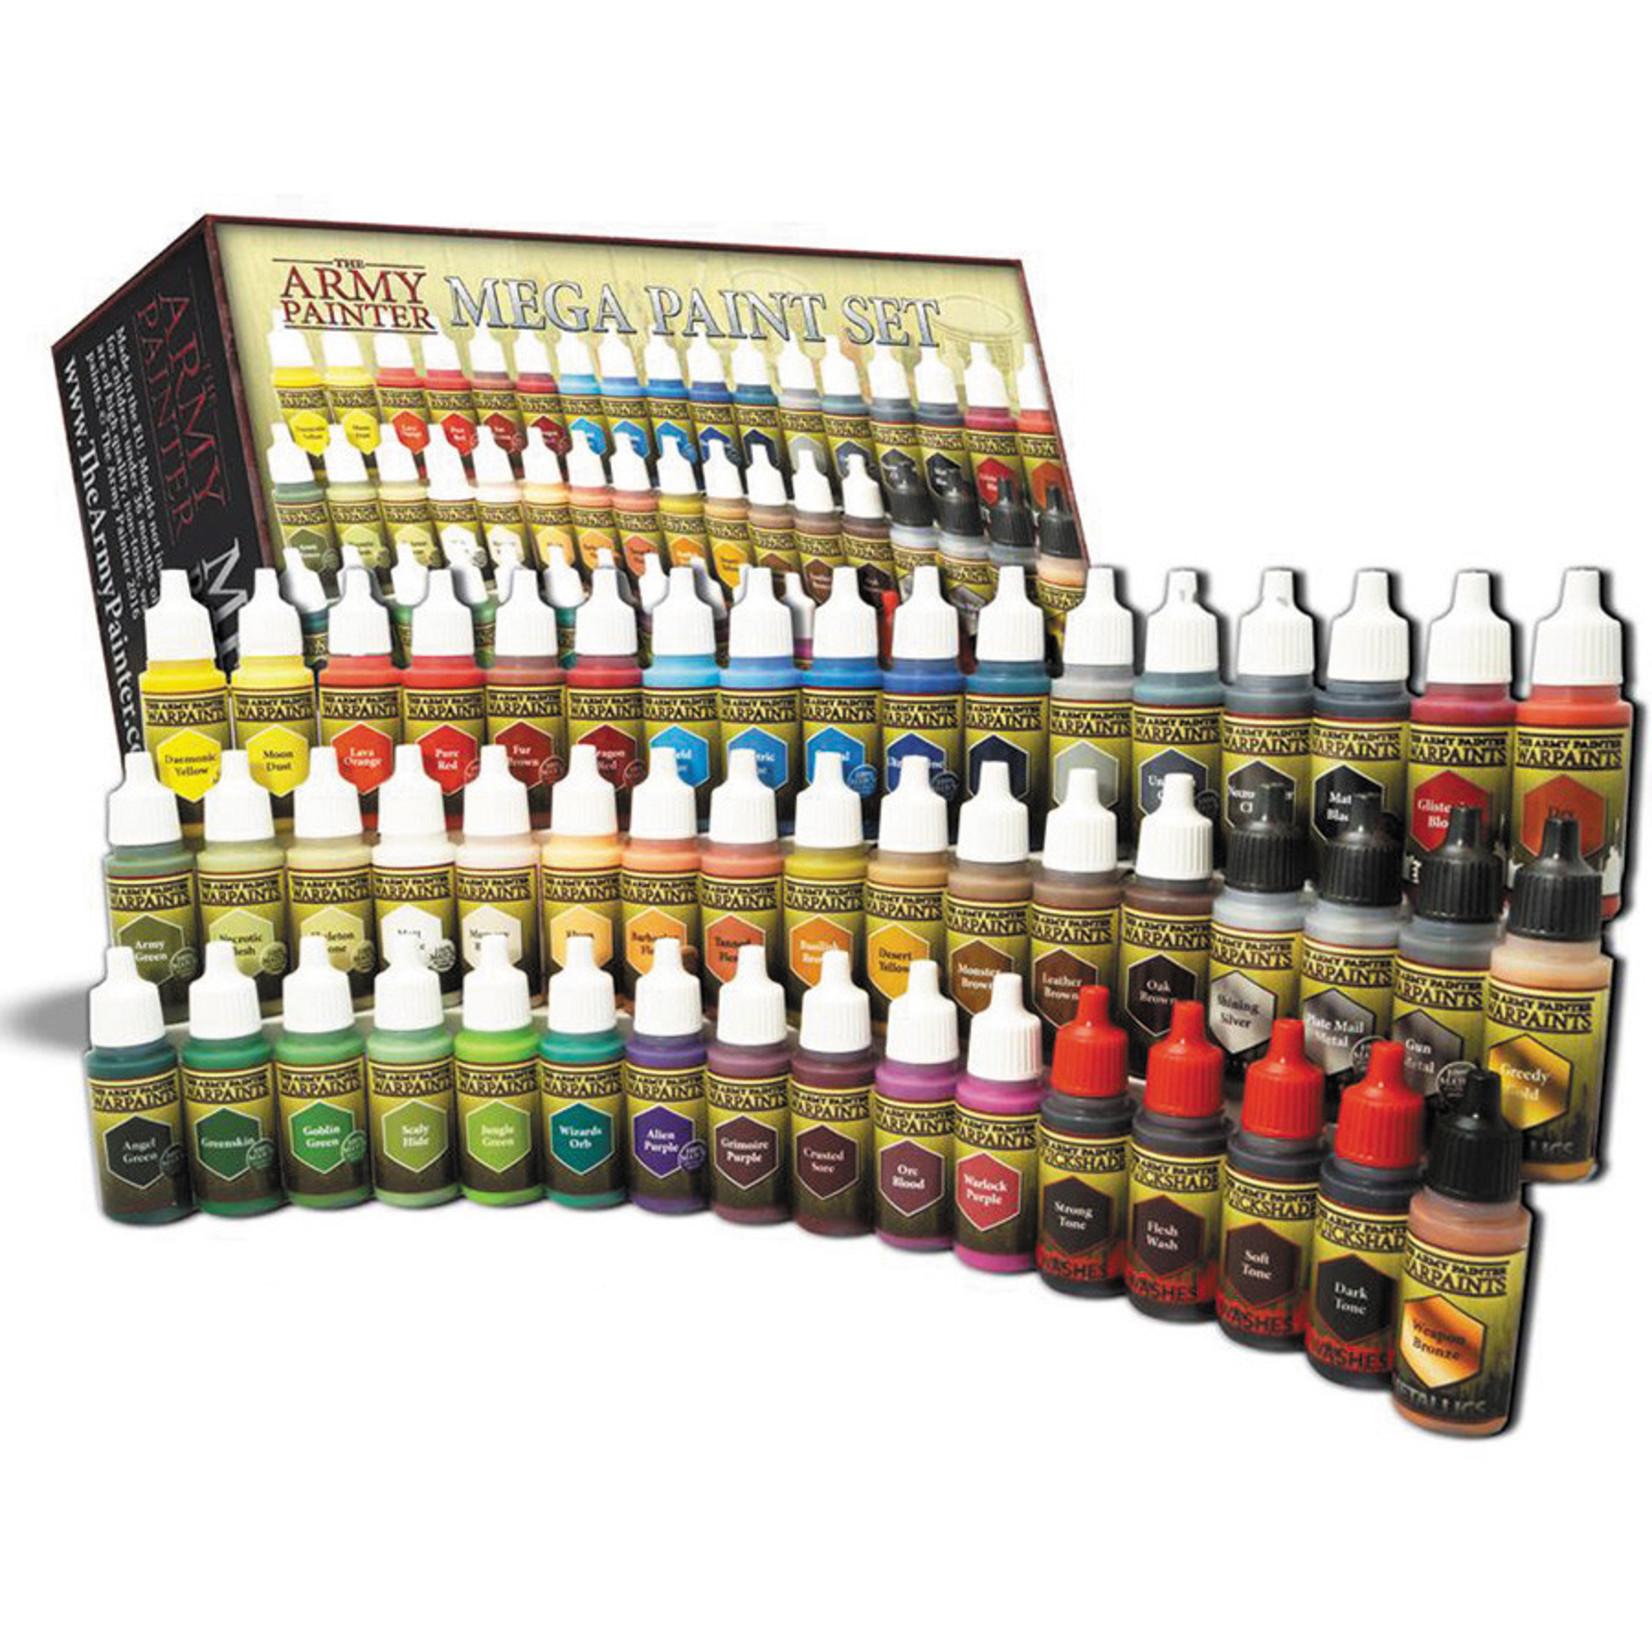 Army Painter Army Painter Mega Paint Set 2017